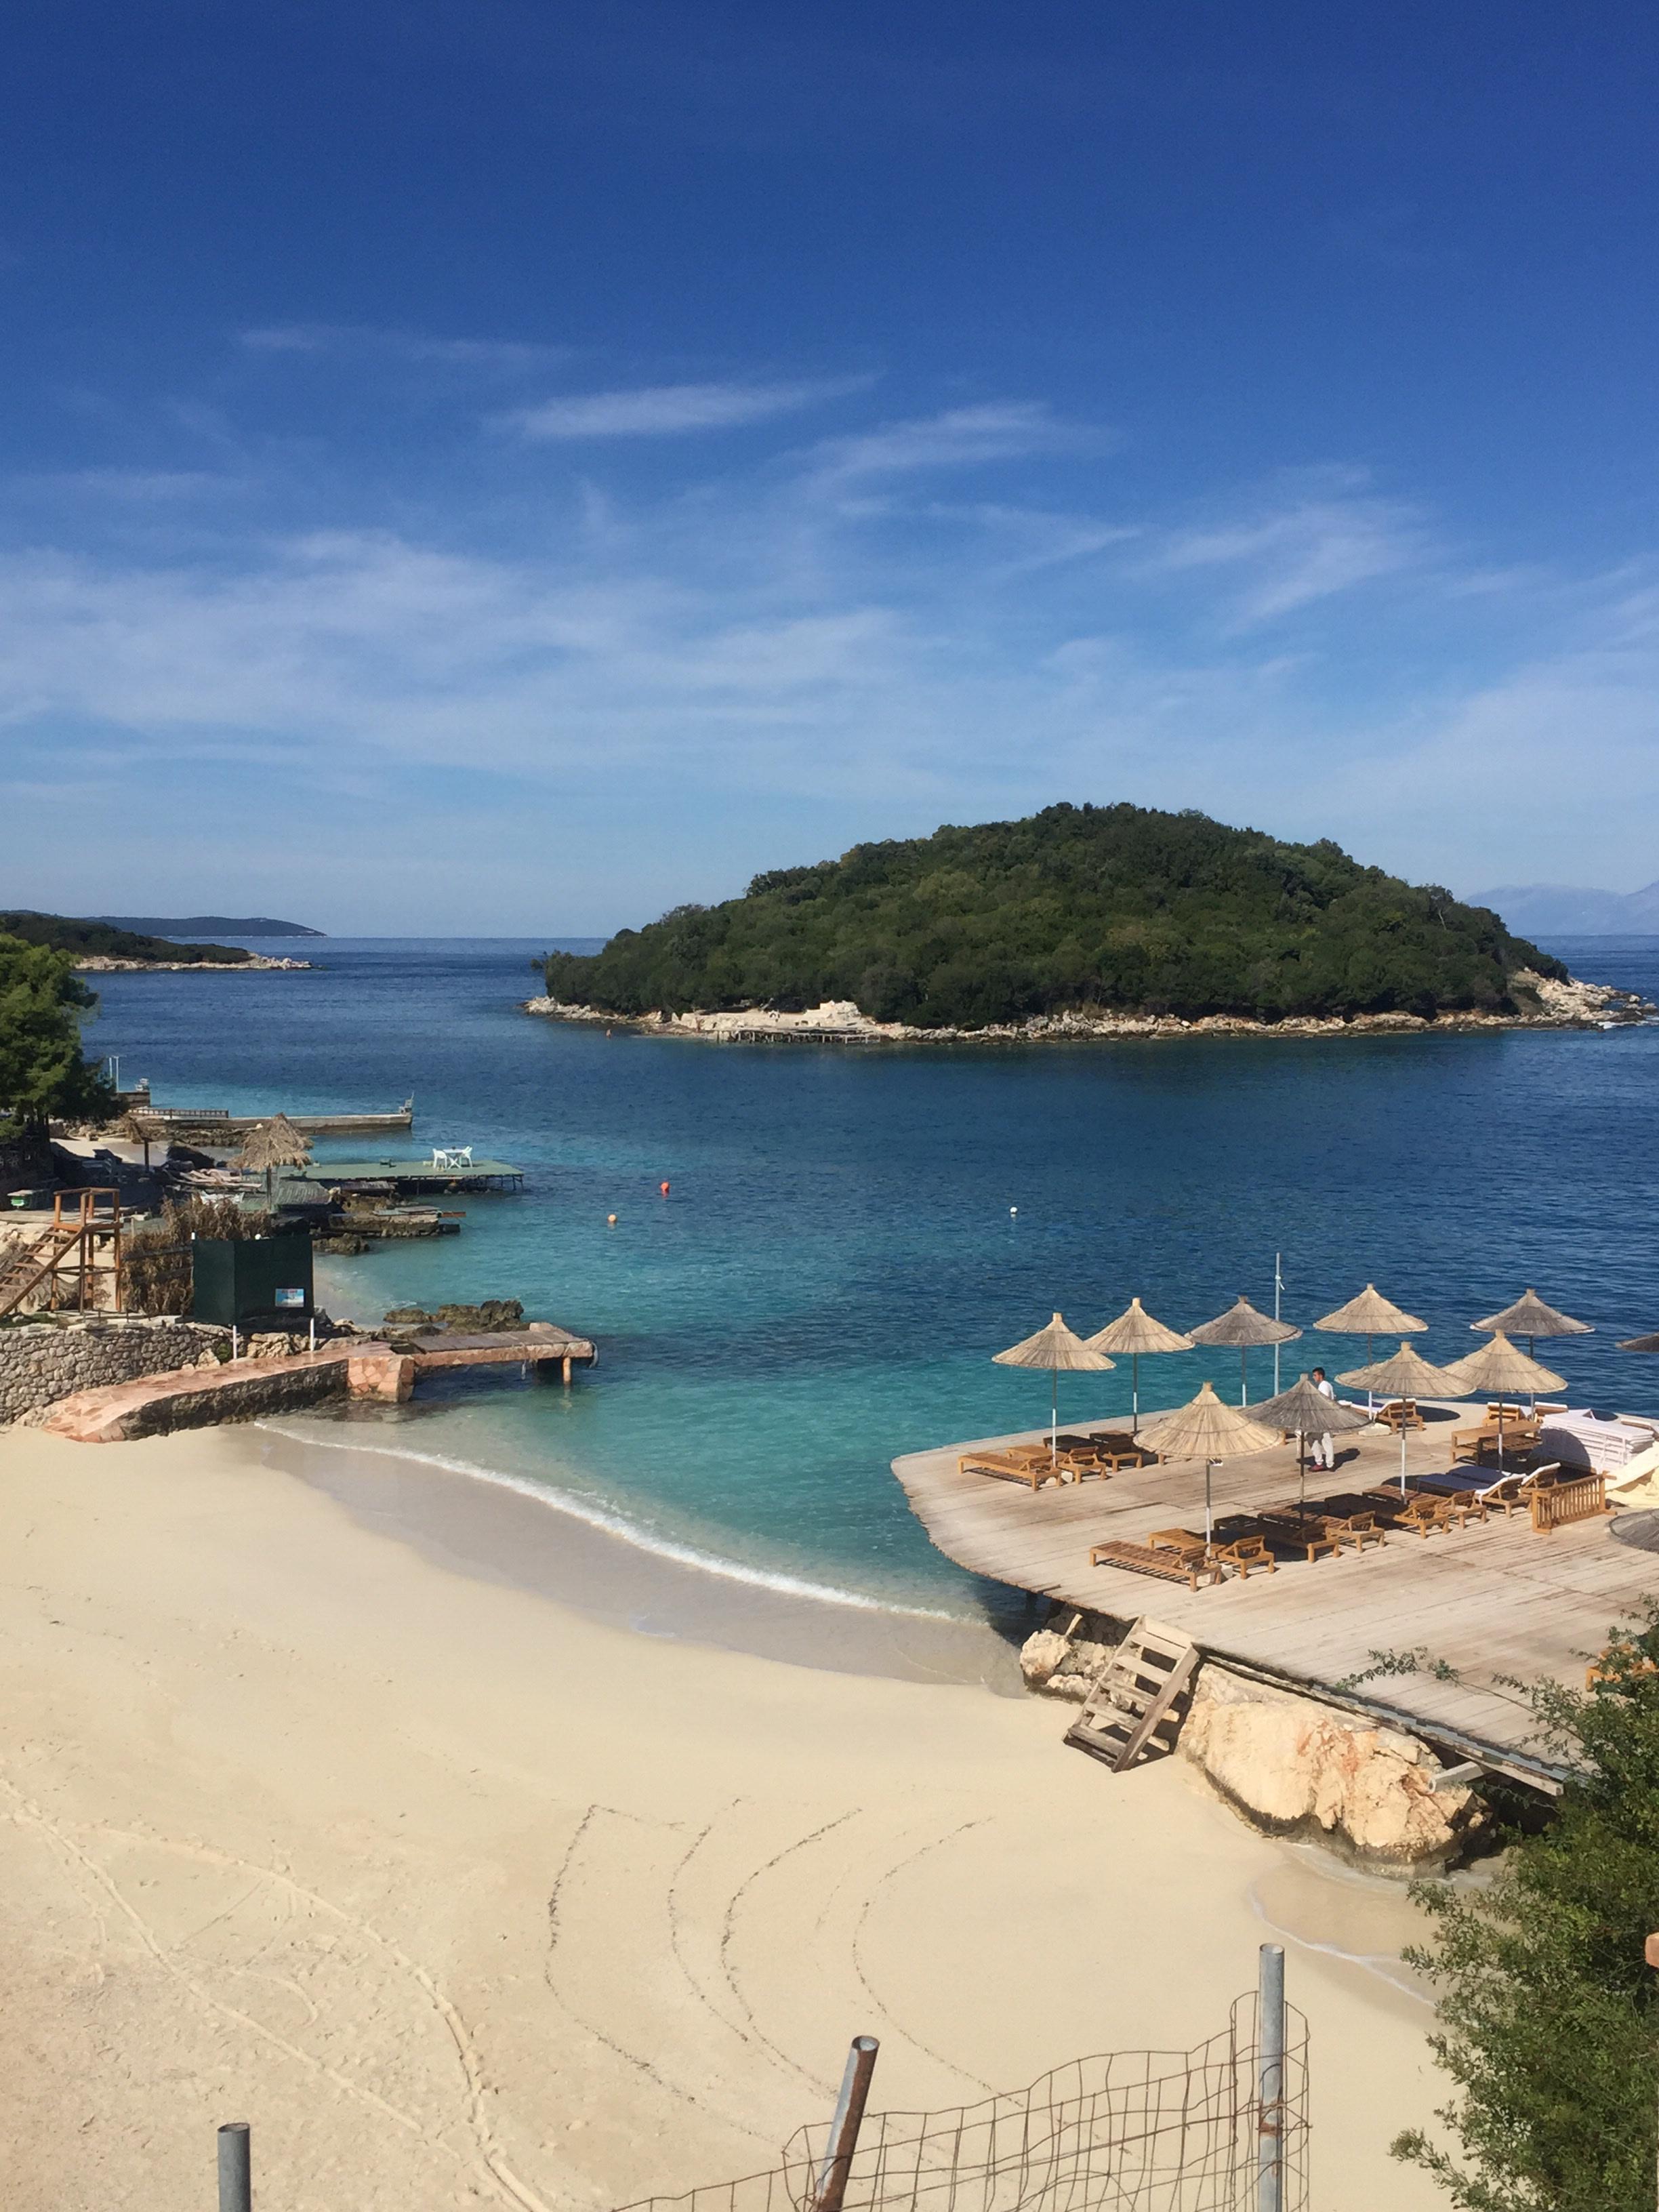 Admire the stunning views of Ksamil Islands